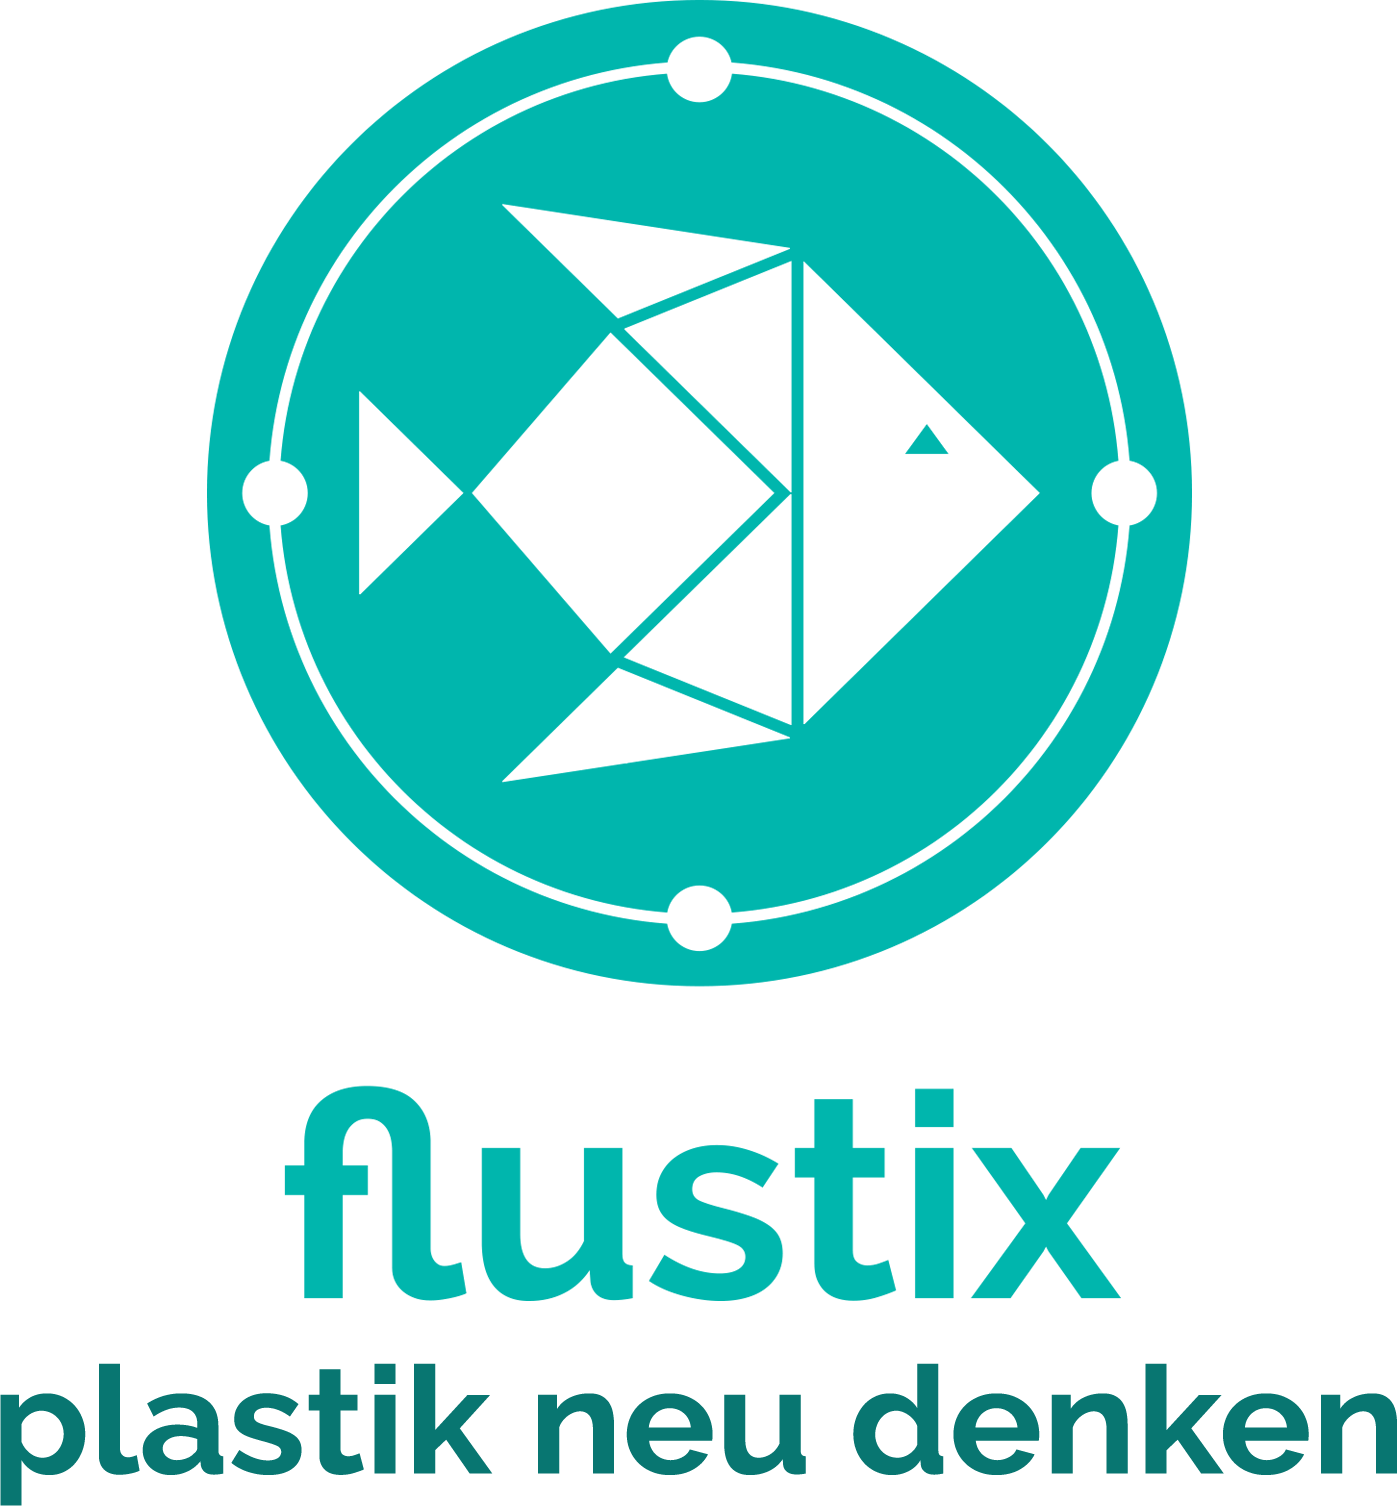 Flustix - Plastik neu denken